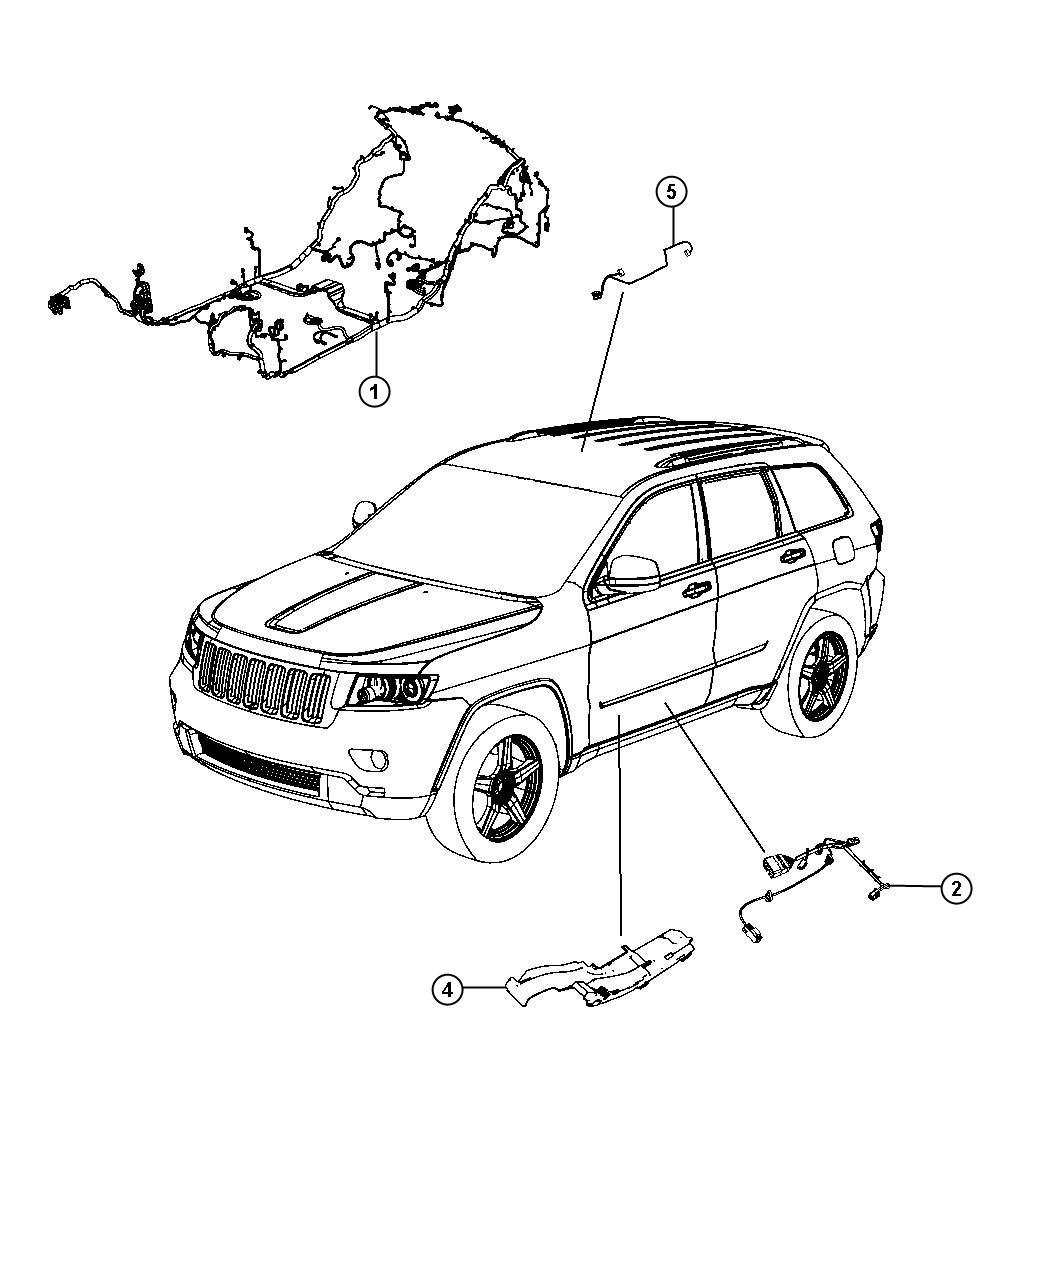 Jeep Grand Cherokee Wiring Body Export 6 Speakers 6